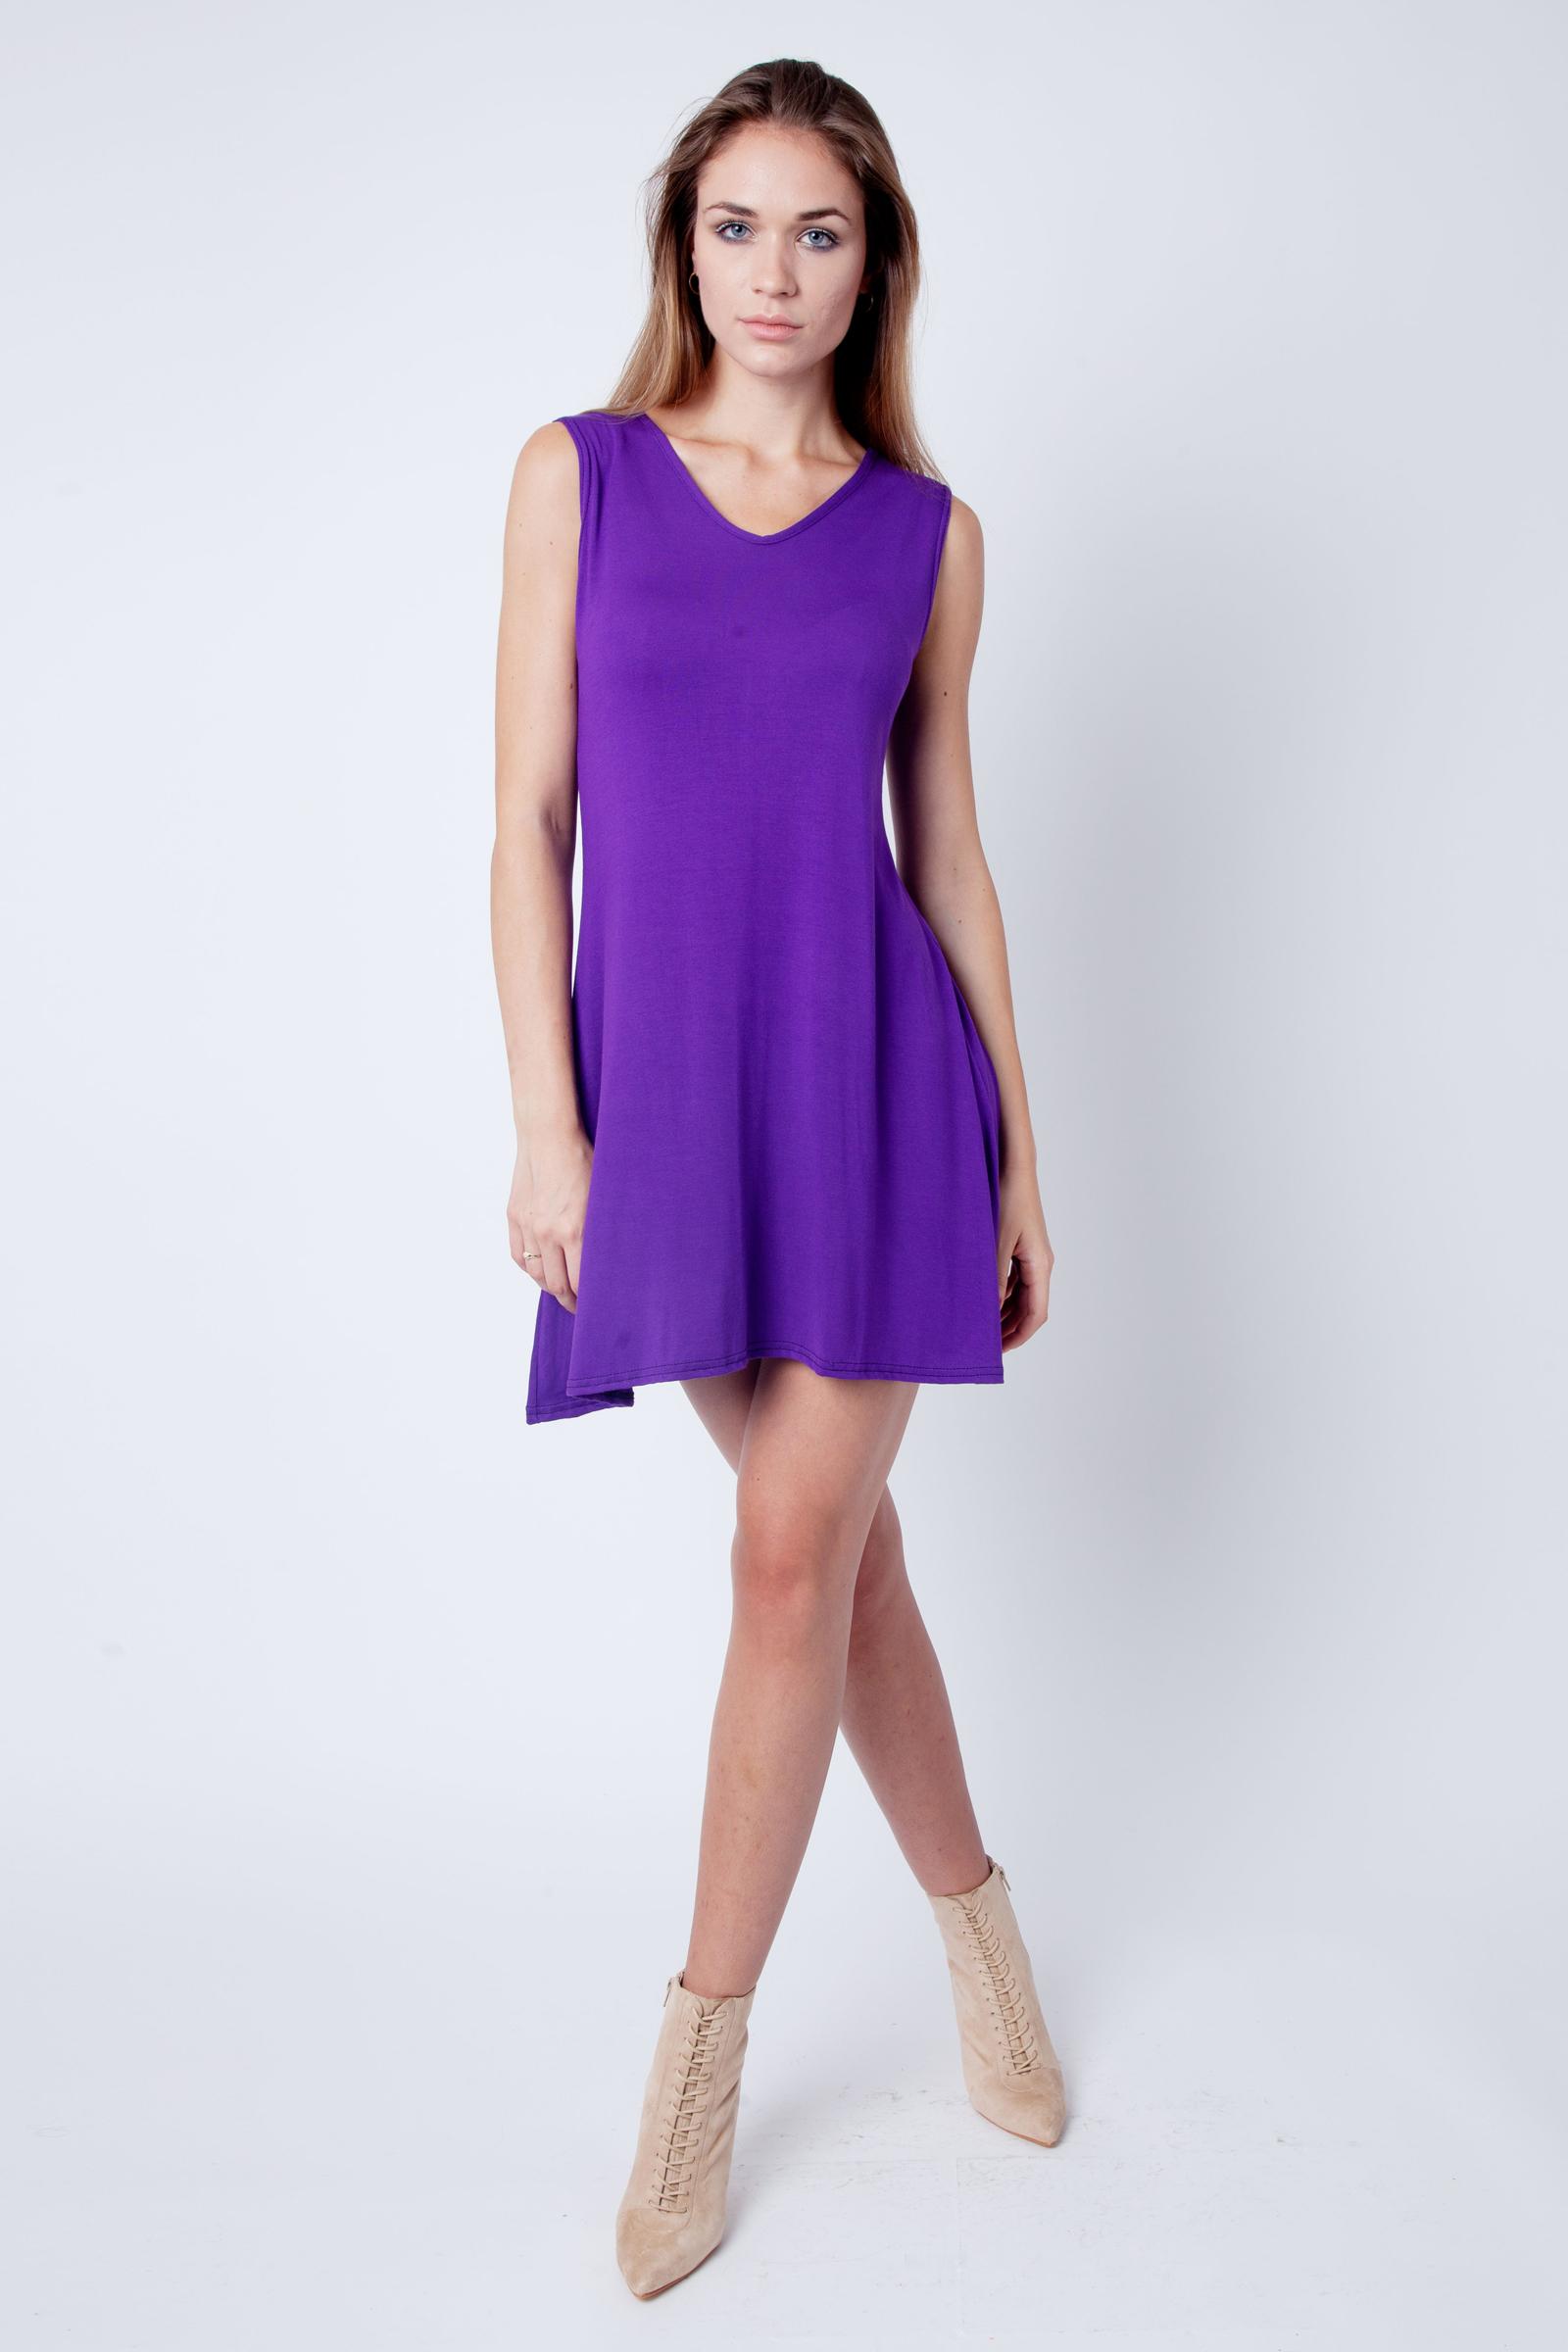 639329451a87 Purple V-Neck Sleeveless Skater Dress